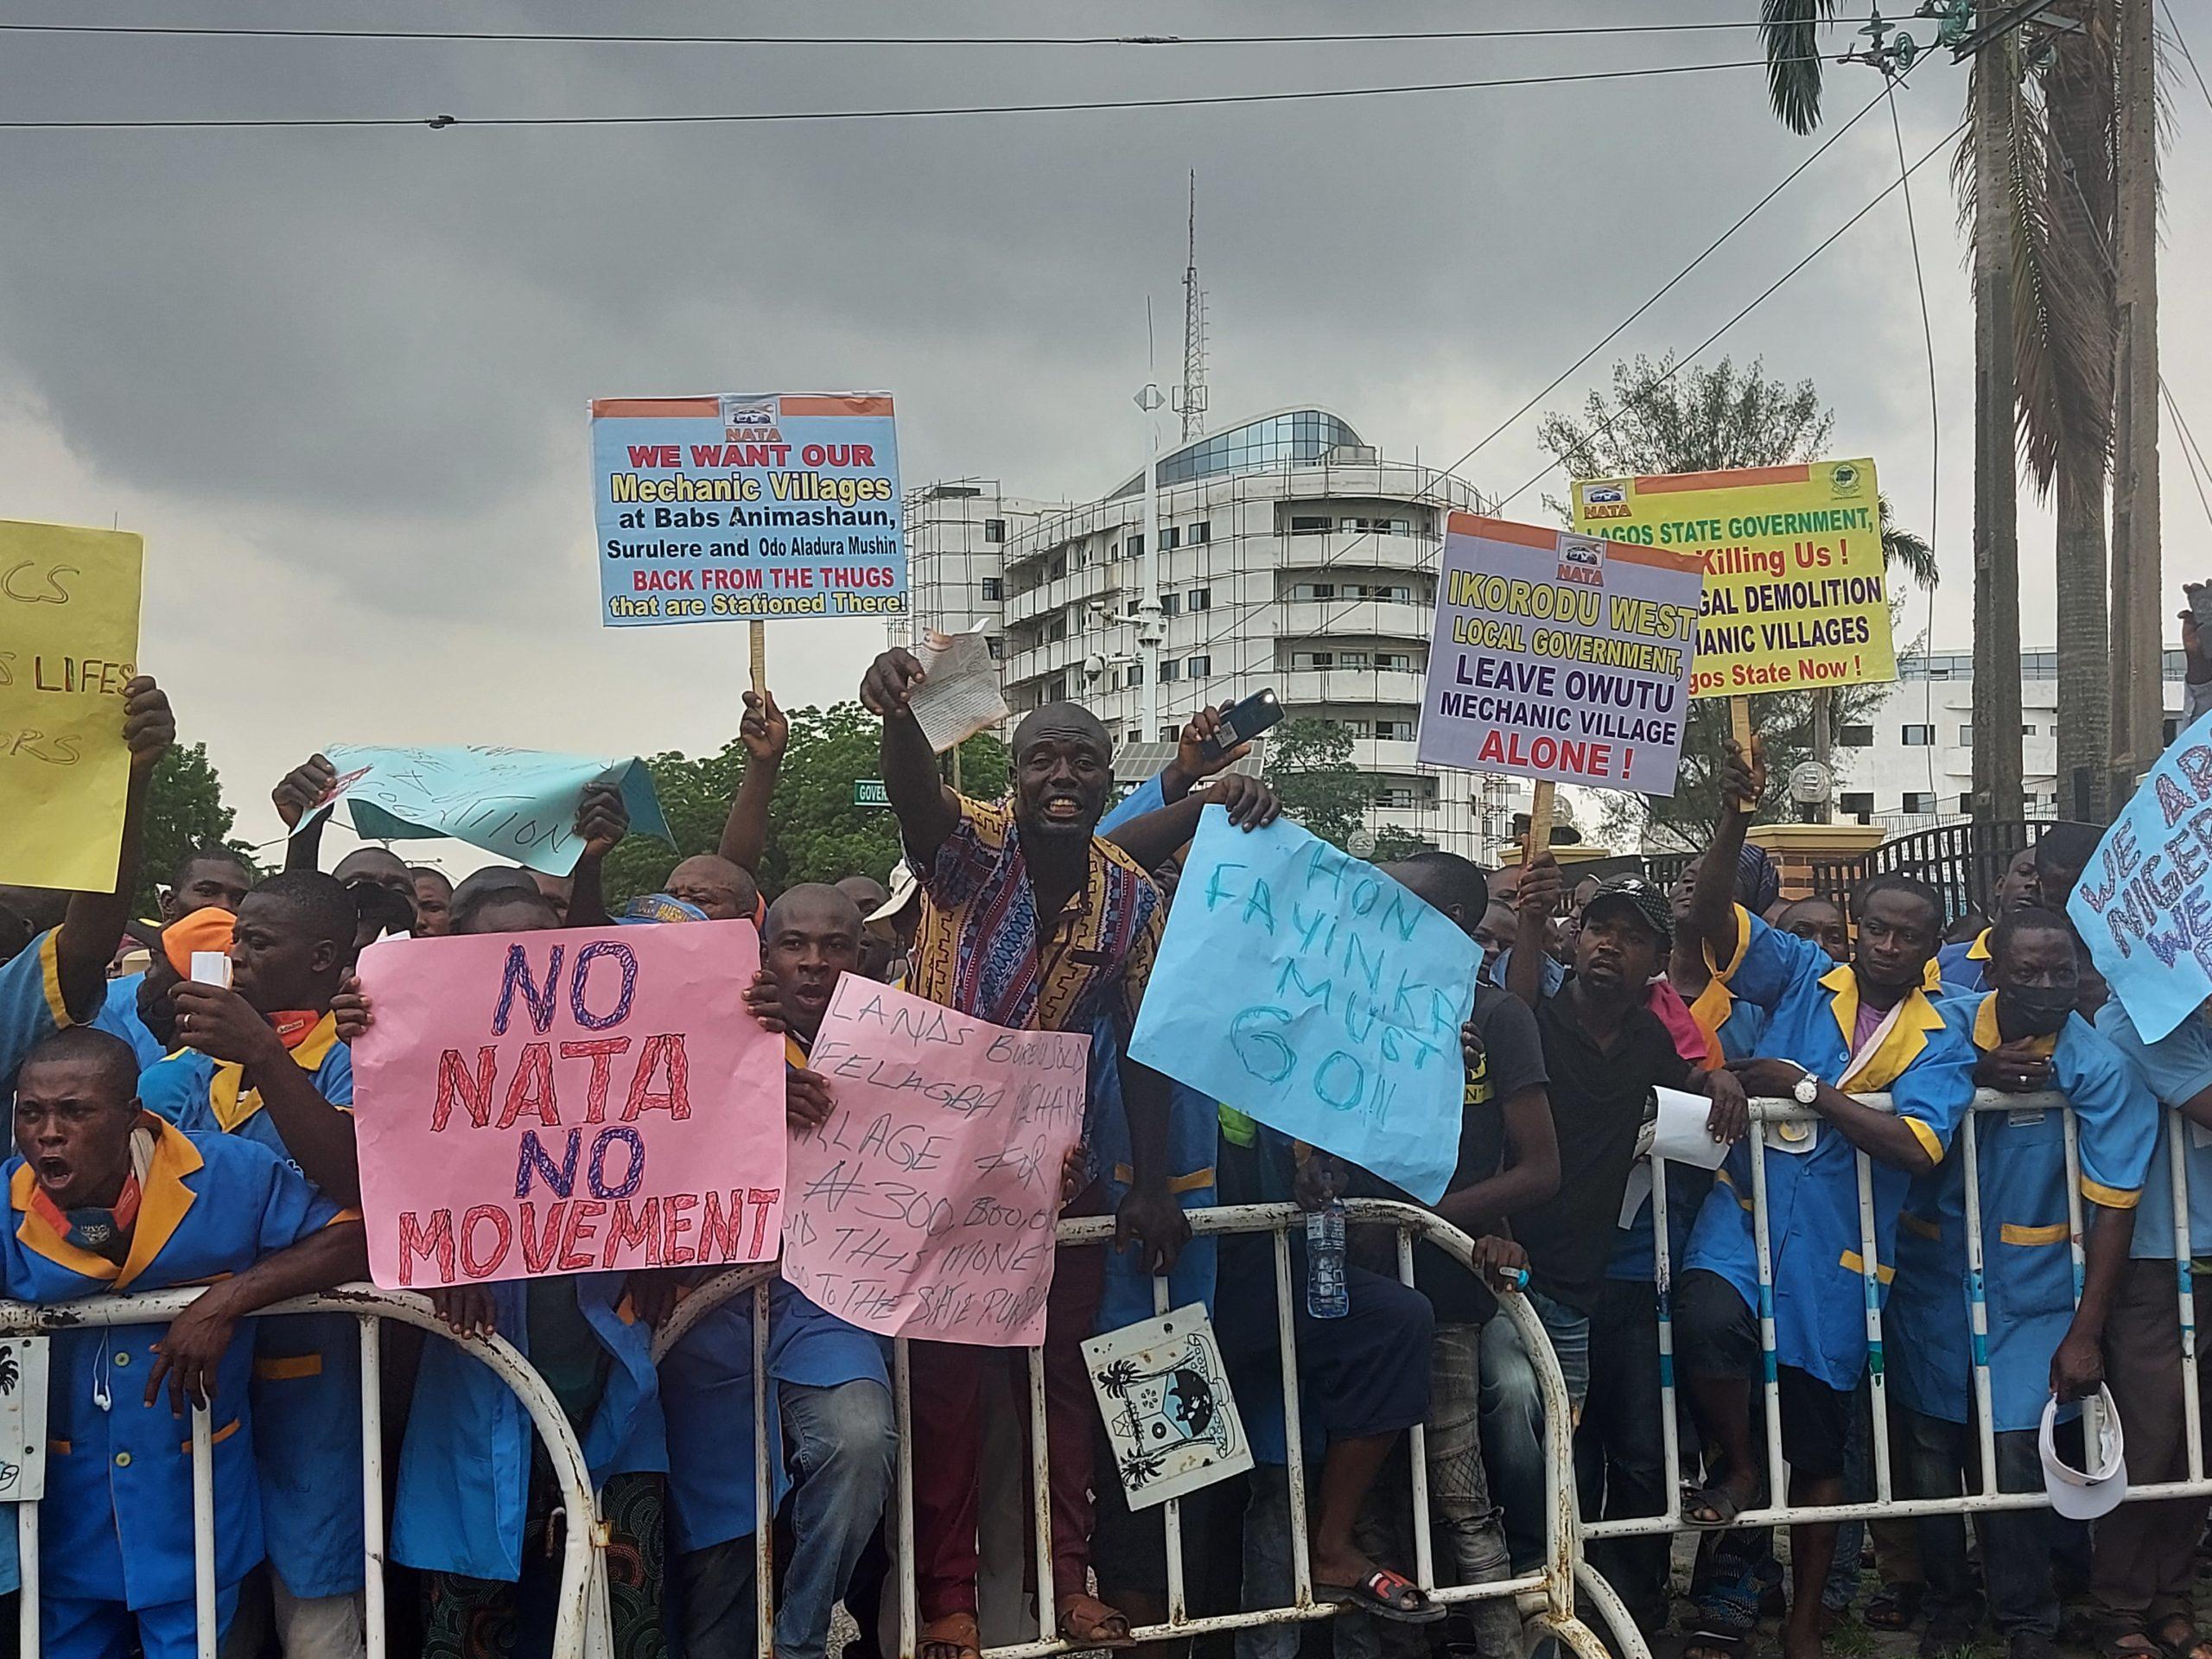 Lagos mechanics protest demolition of mechanic workshops and villages.